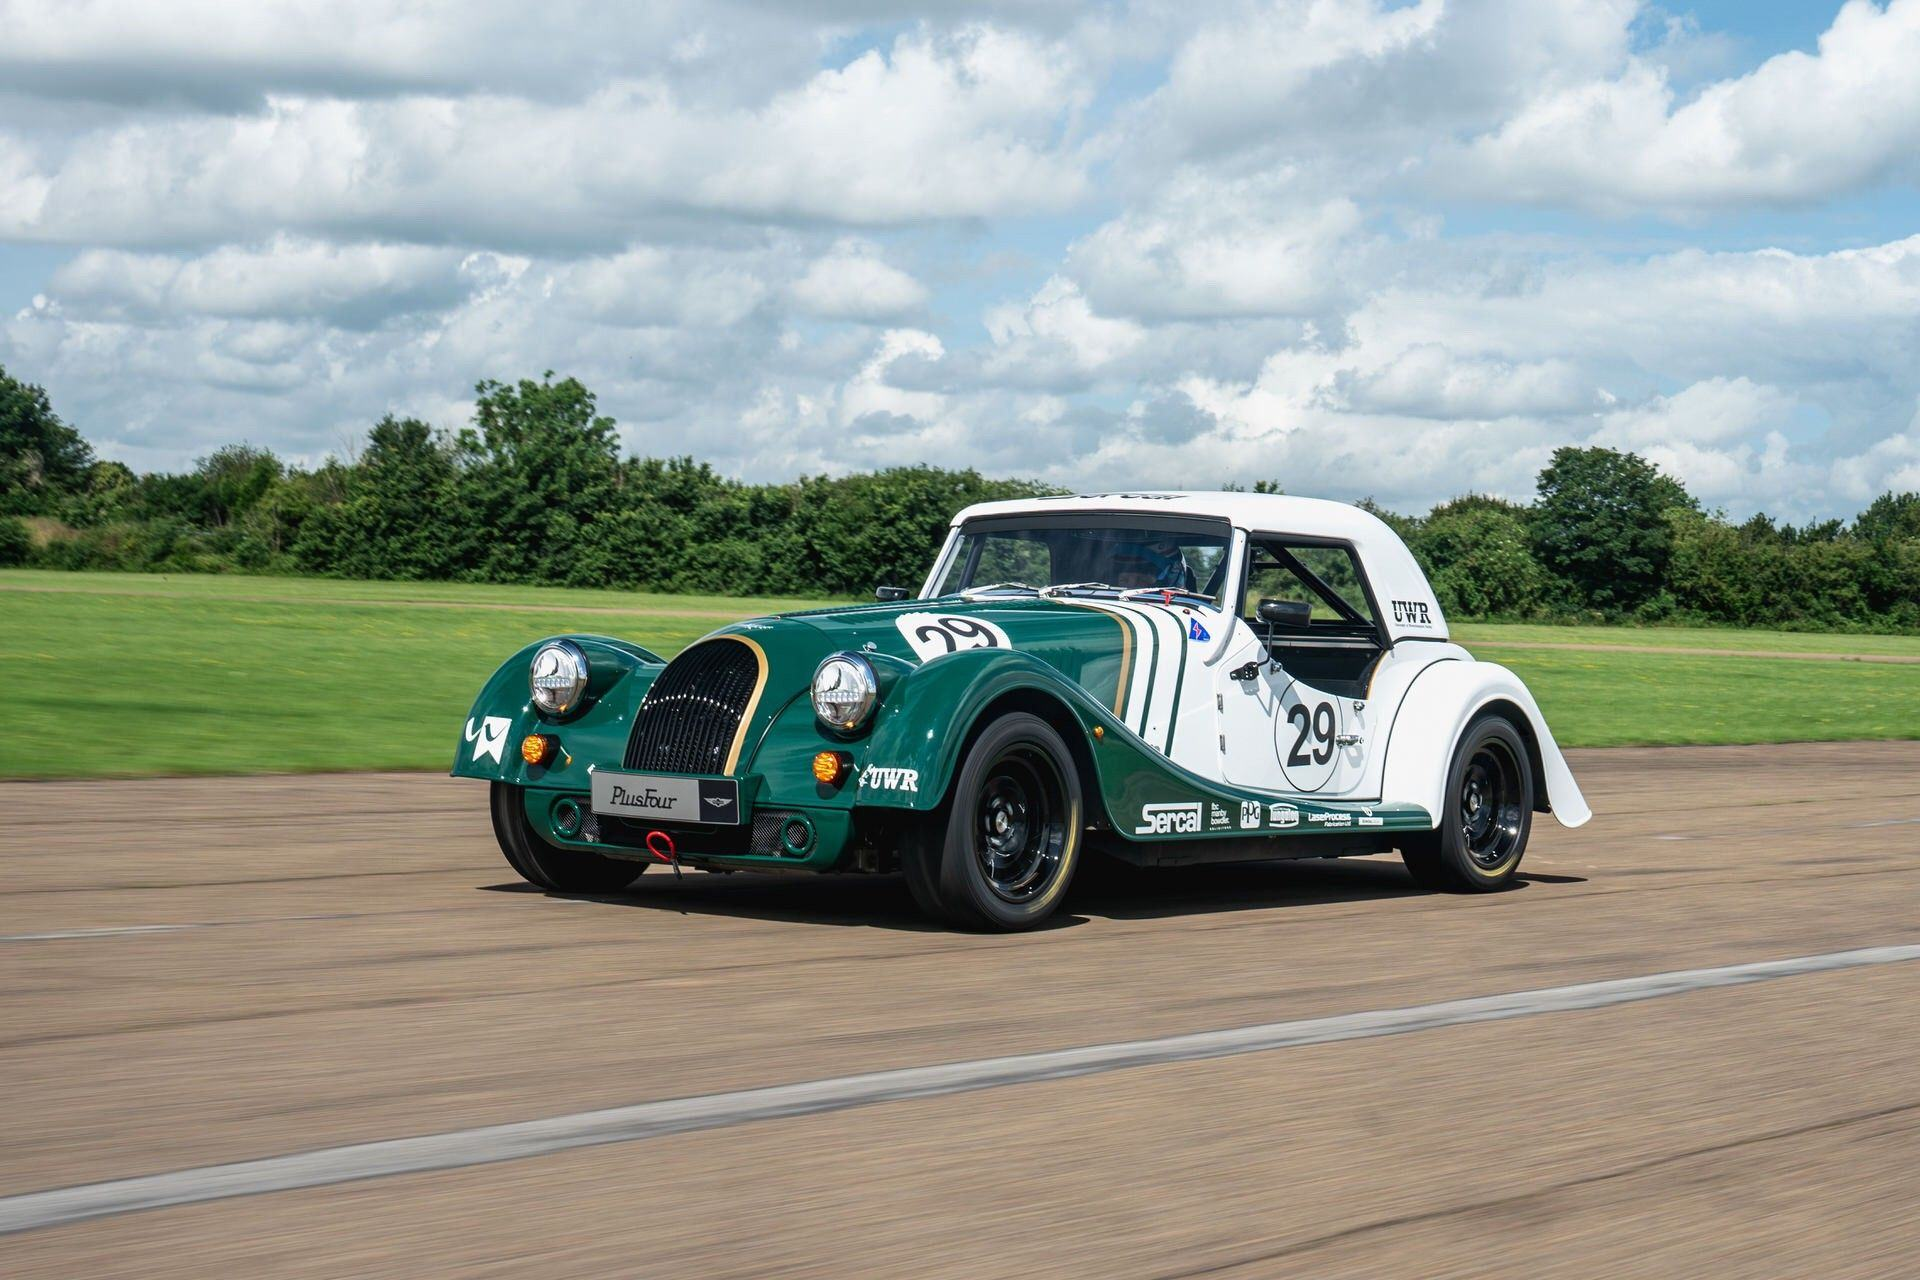 Morgan_Plus_Four_race_cars-0010